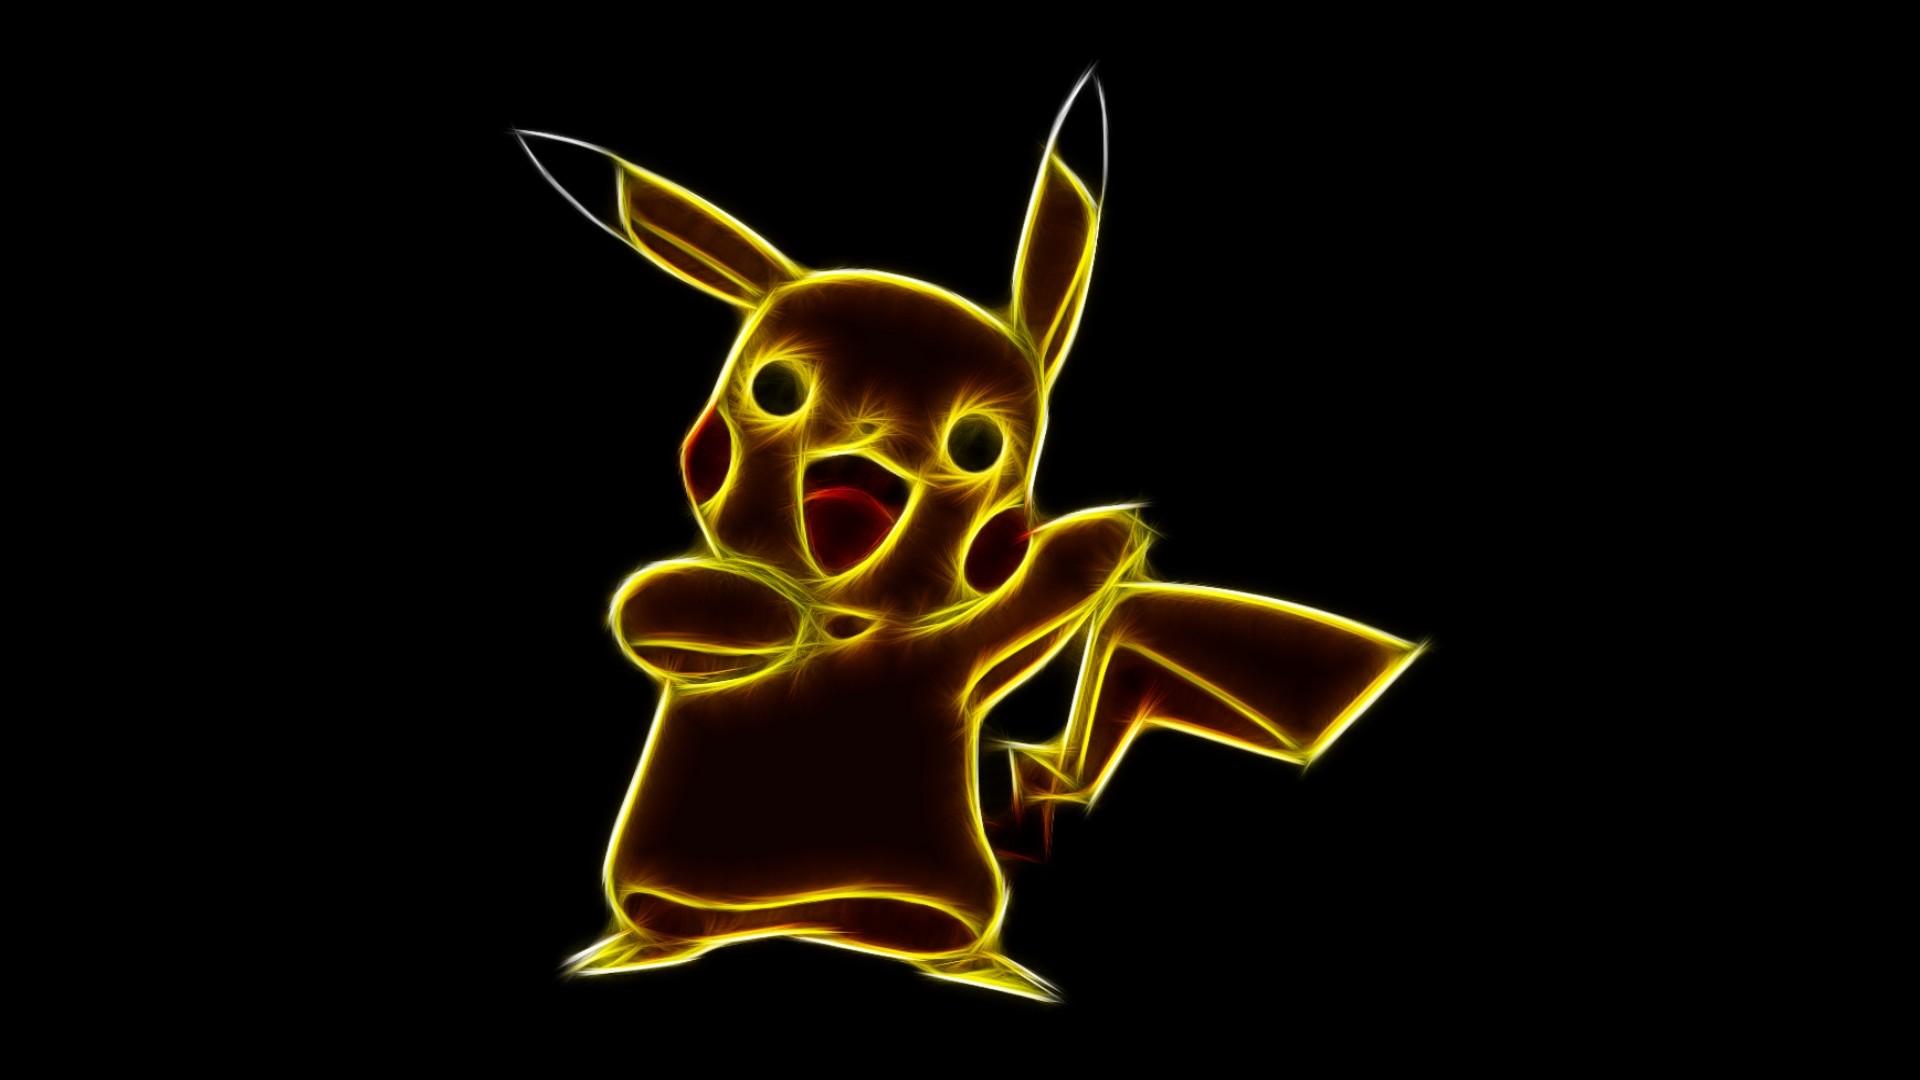 Pikachu by TheBlackSavior Pikachu by TheBlackSavior